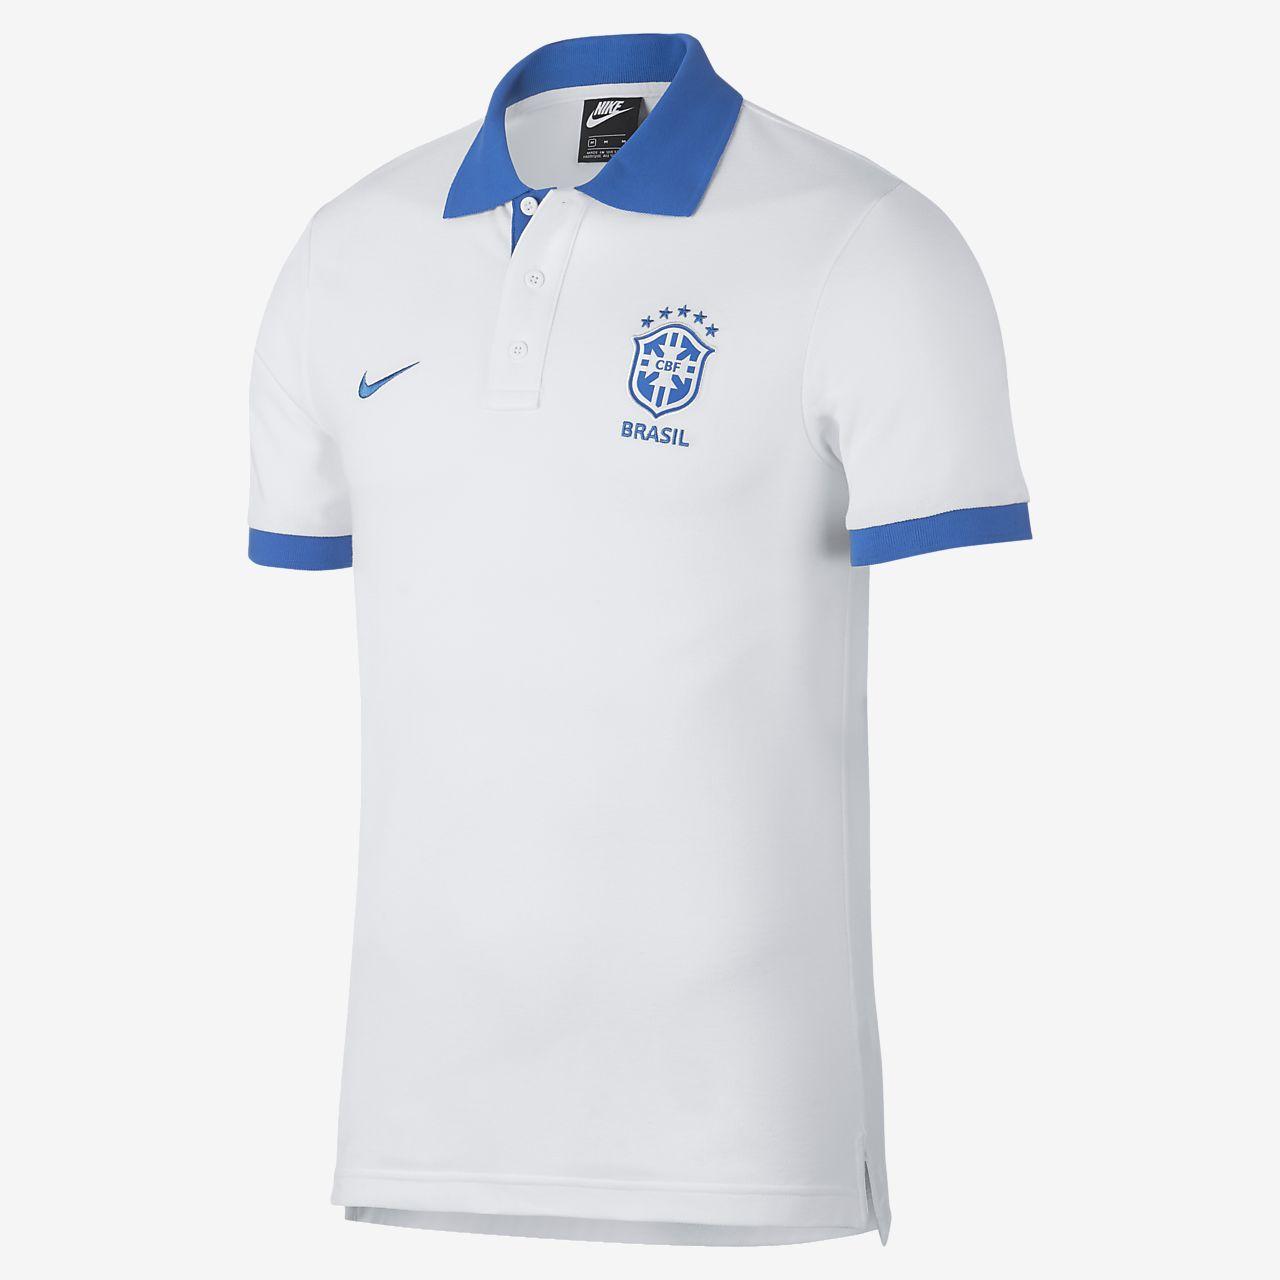 Brazil CBF Men's Football Polo